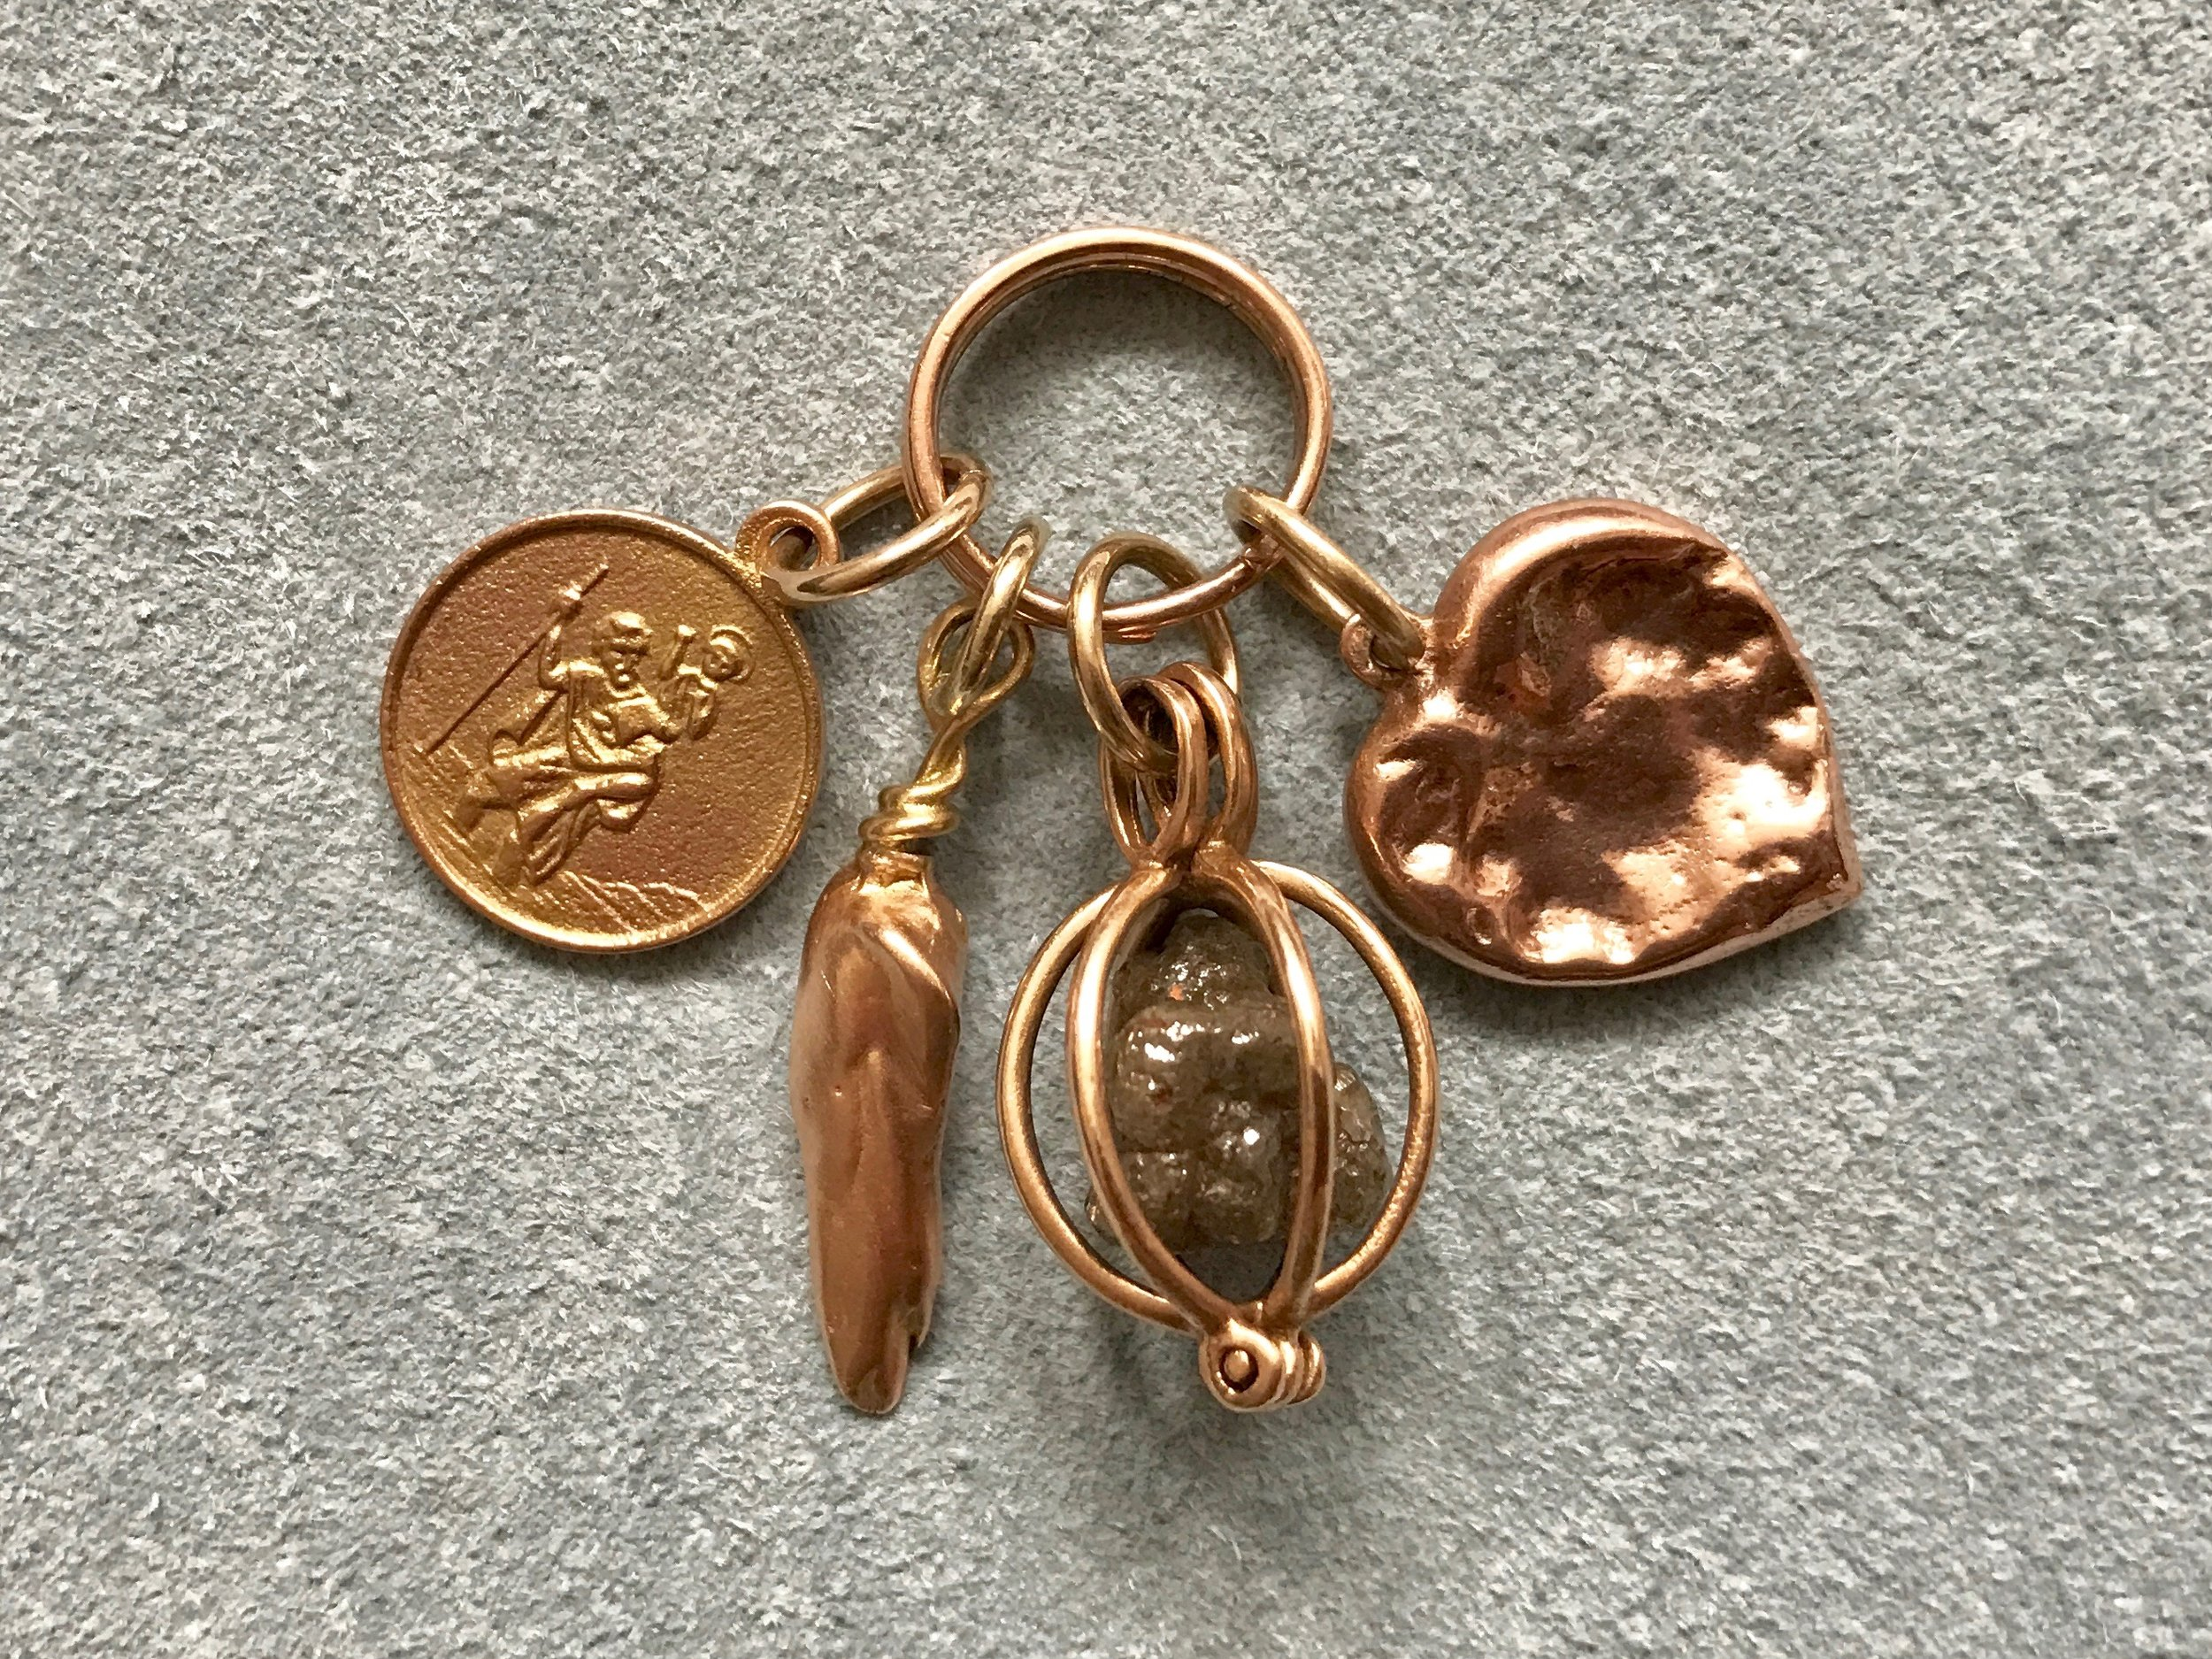 ROSE GOLD ST. CHRISTOPHER MEDALLION, MISSISSIPPI CAST PENDANT ROUGH DIAMOND BASKET AND CHEWED HEART